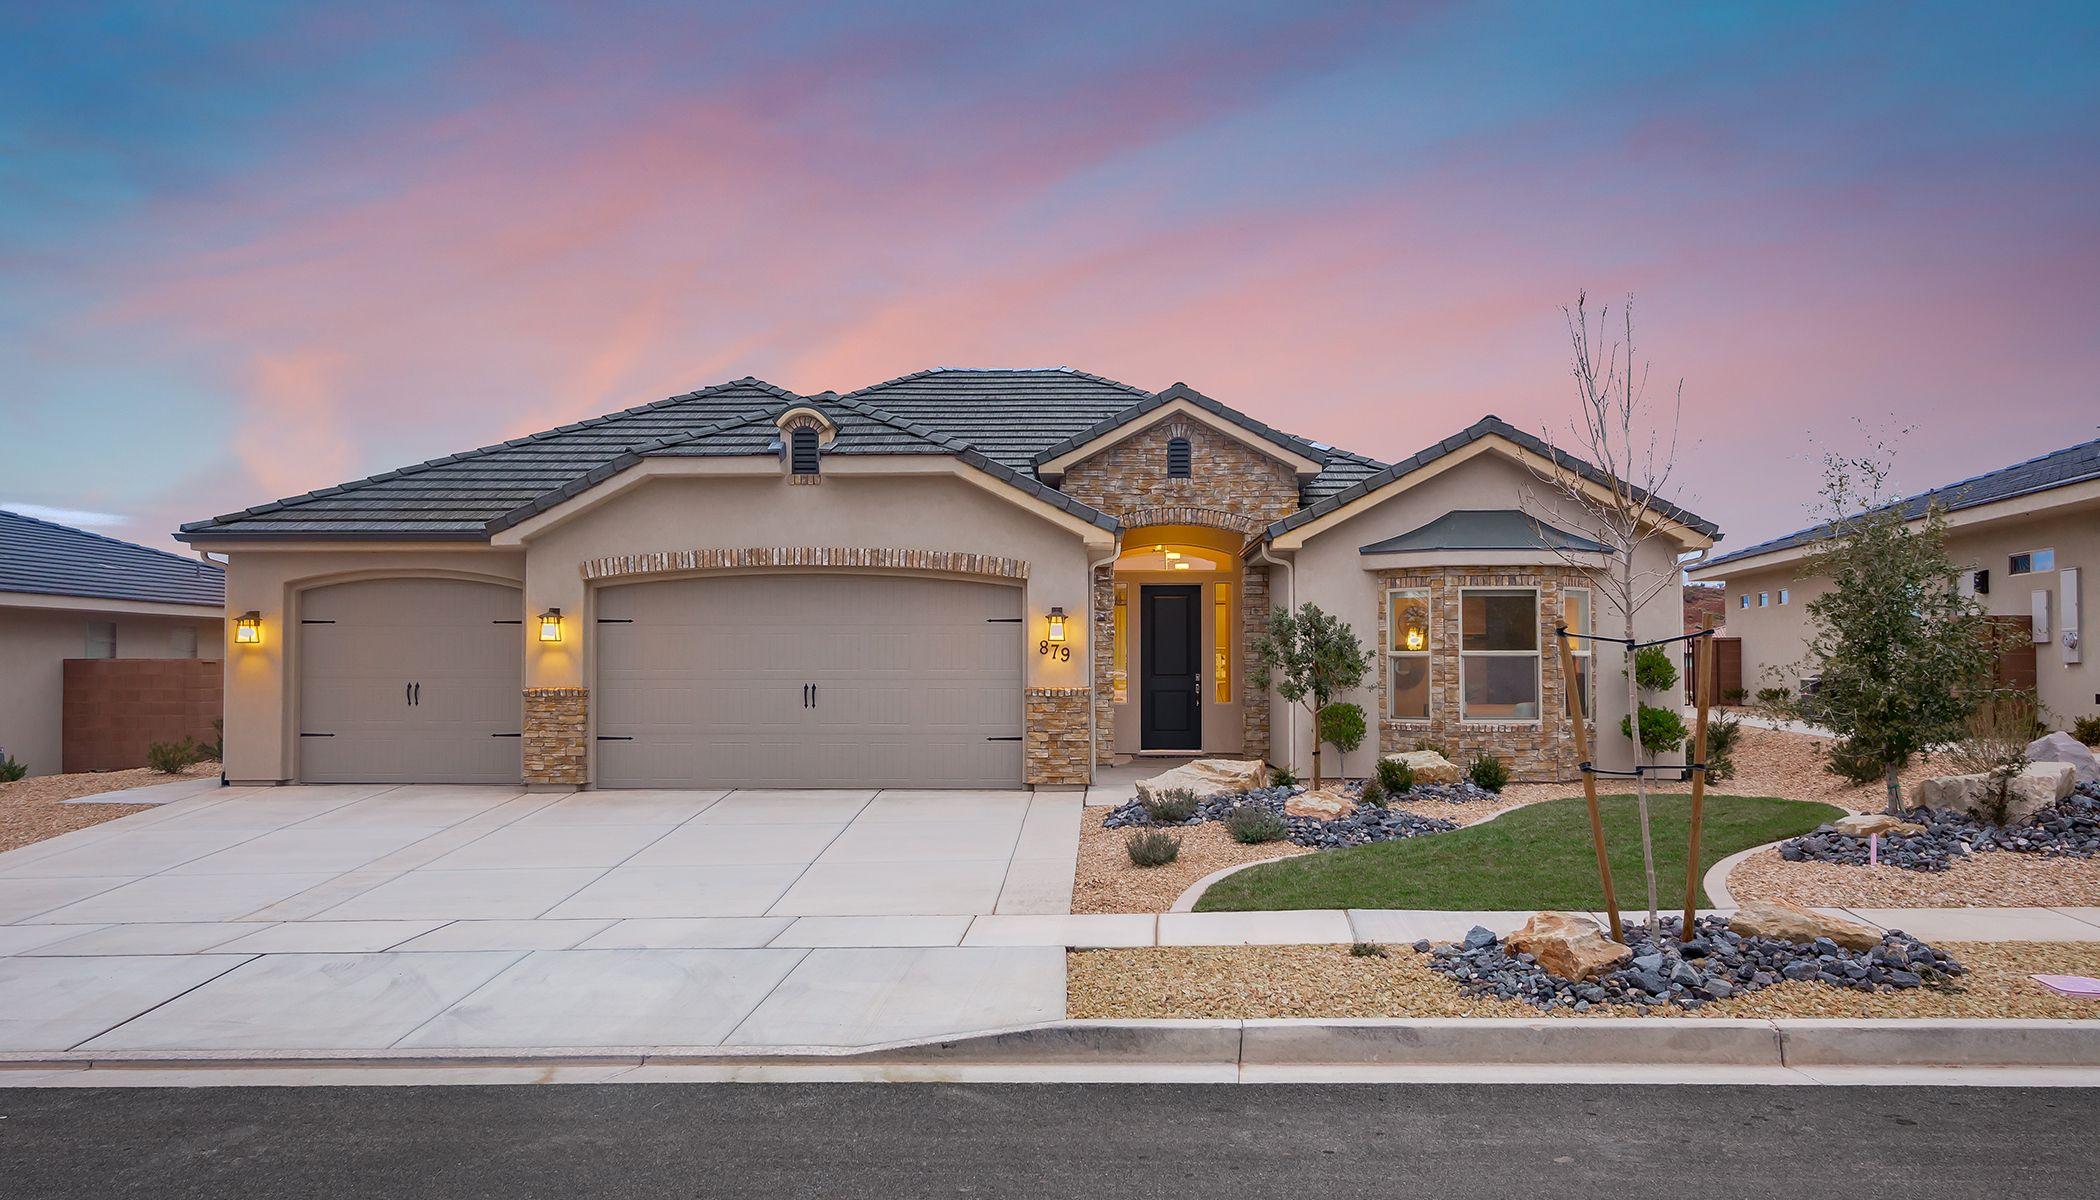 New Homes in Saint George, UT | 16 Communities | NewHomeSource